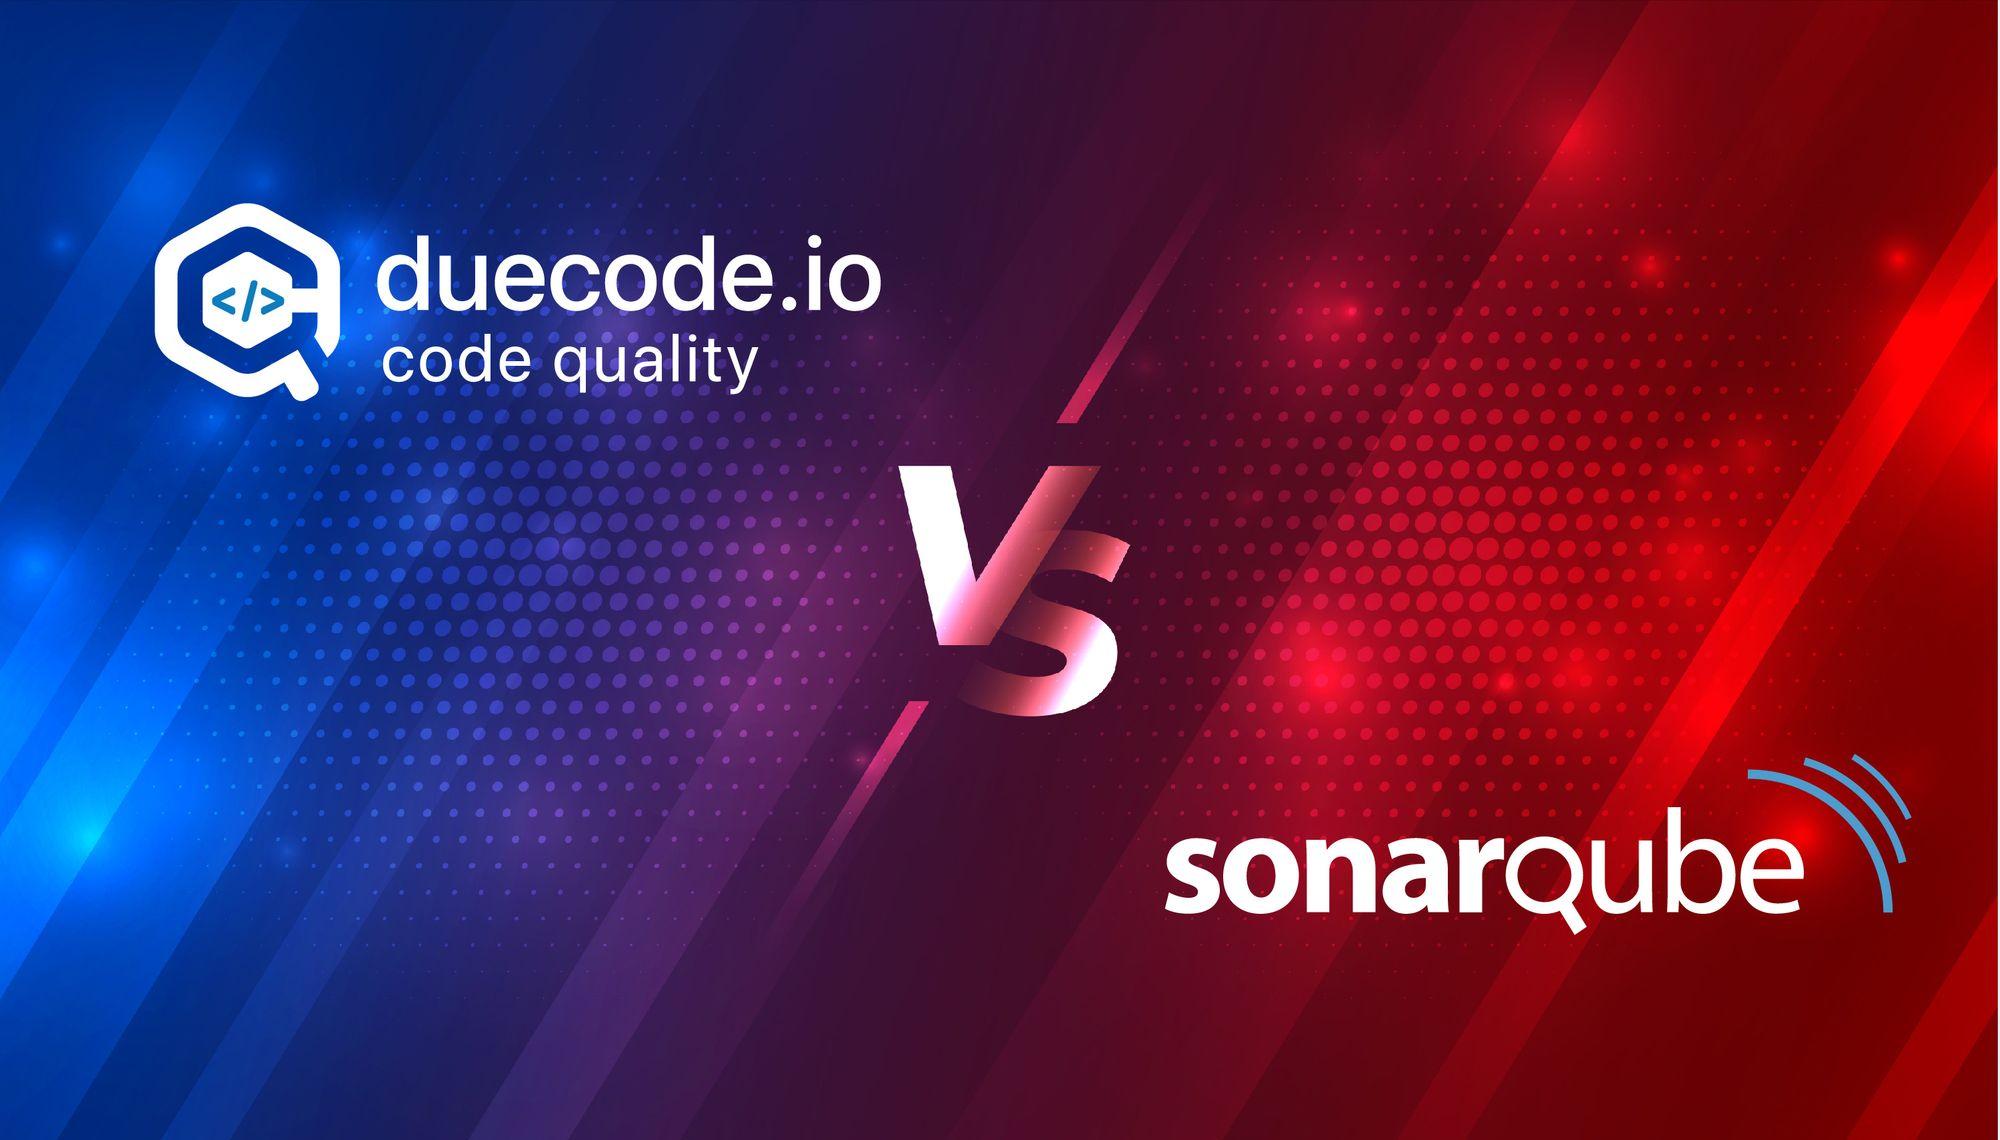 sonarqube alternative - duecode.io